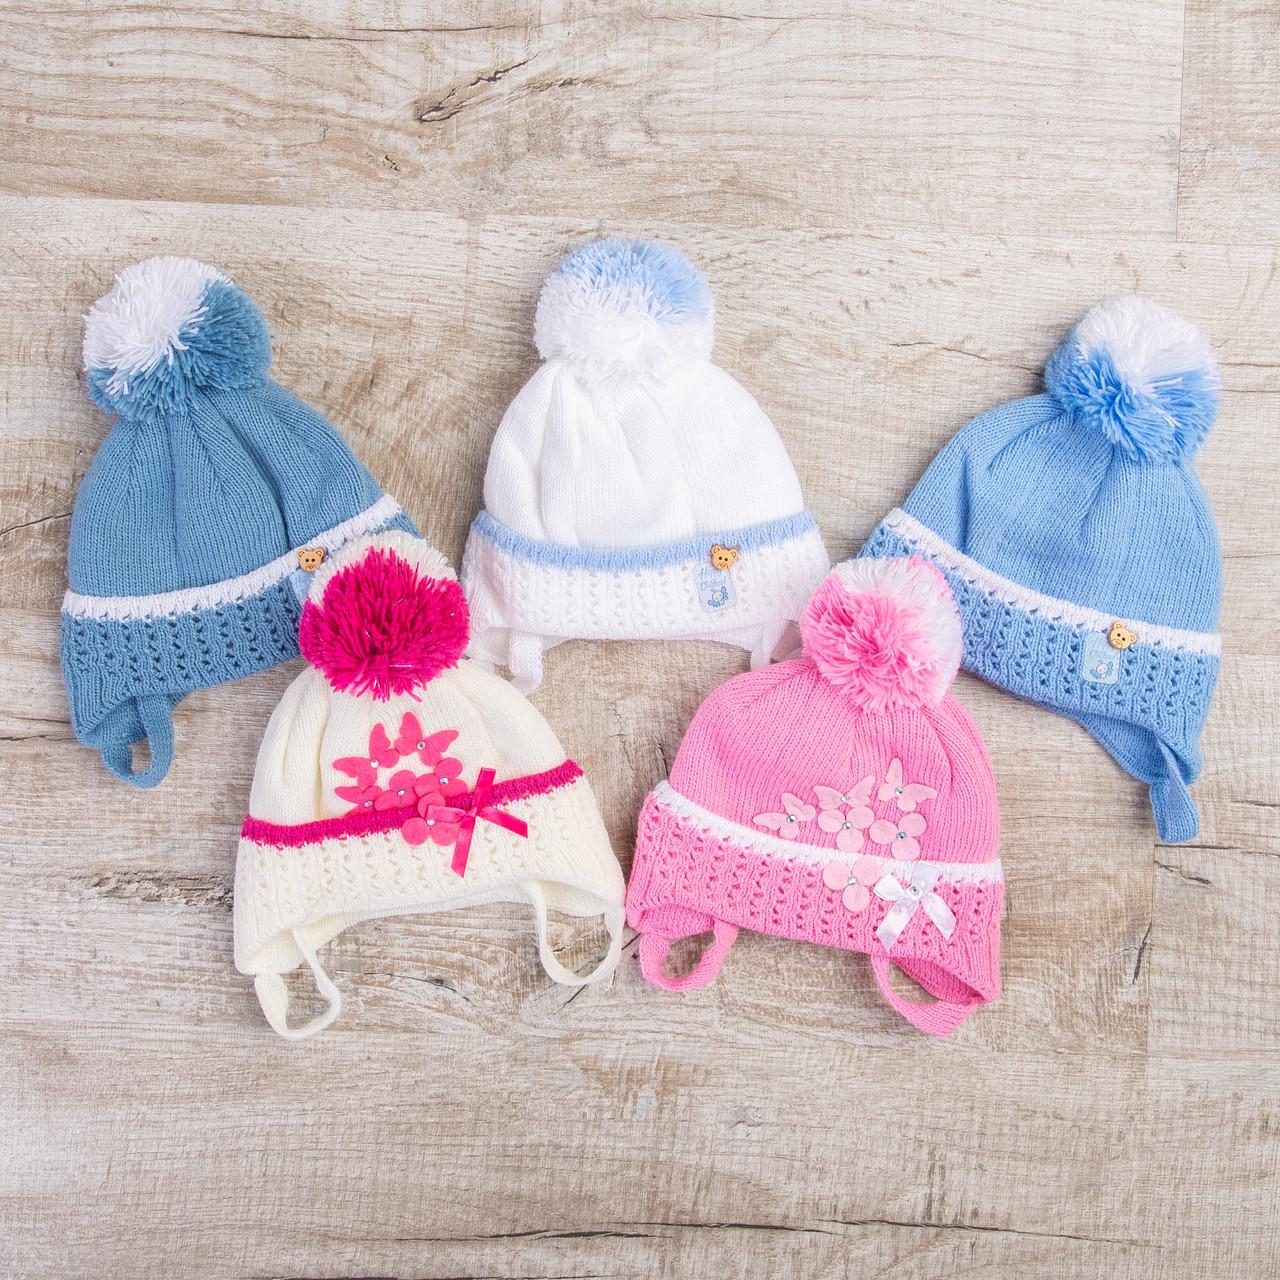 Детская зимняя шапка на завязках оптом - Артикул 0462